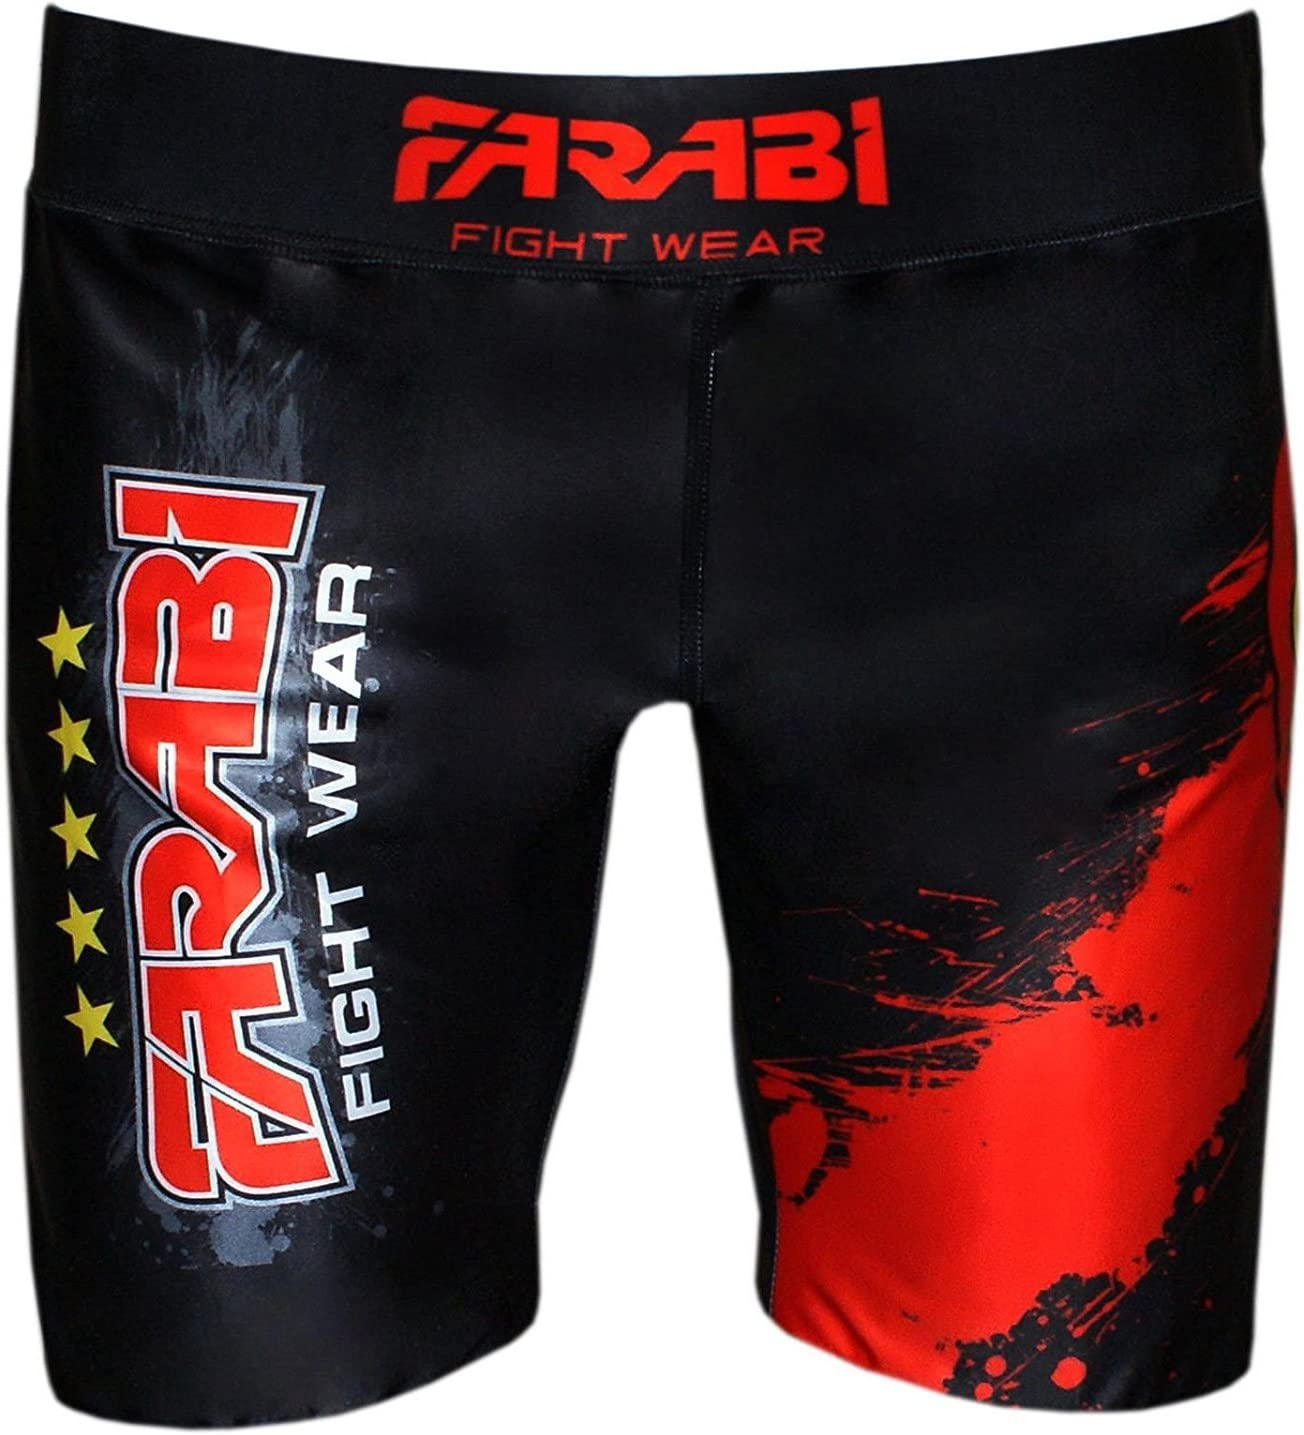 XL MMA vale tudo short grappling fight training match compression tight by farabi